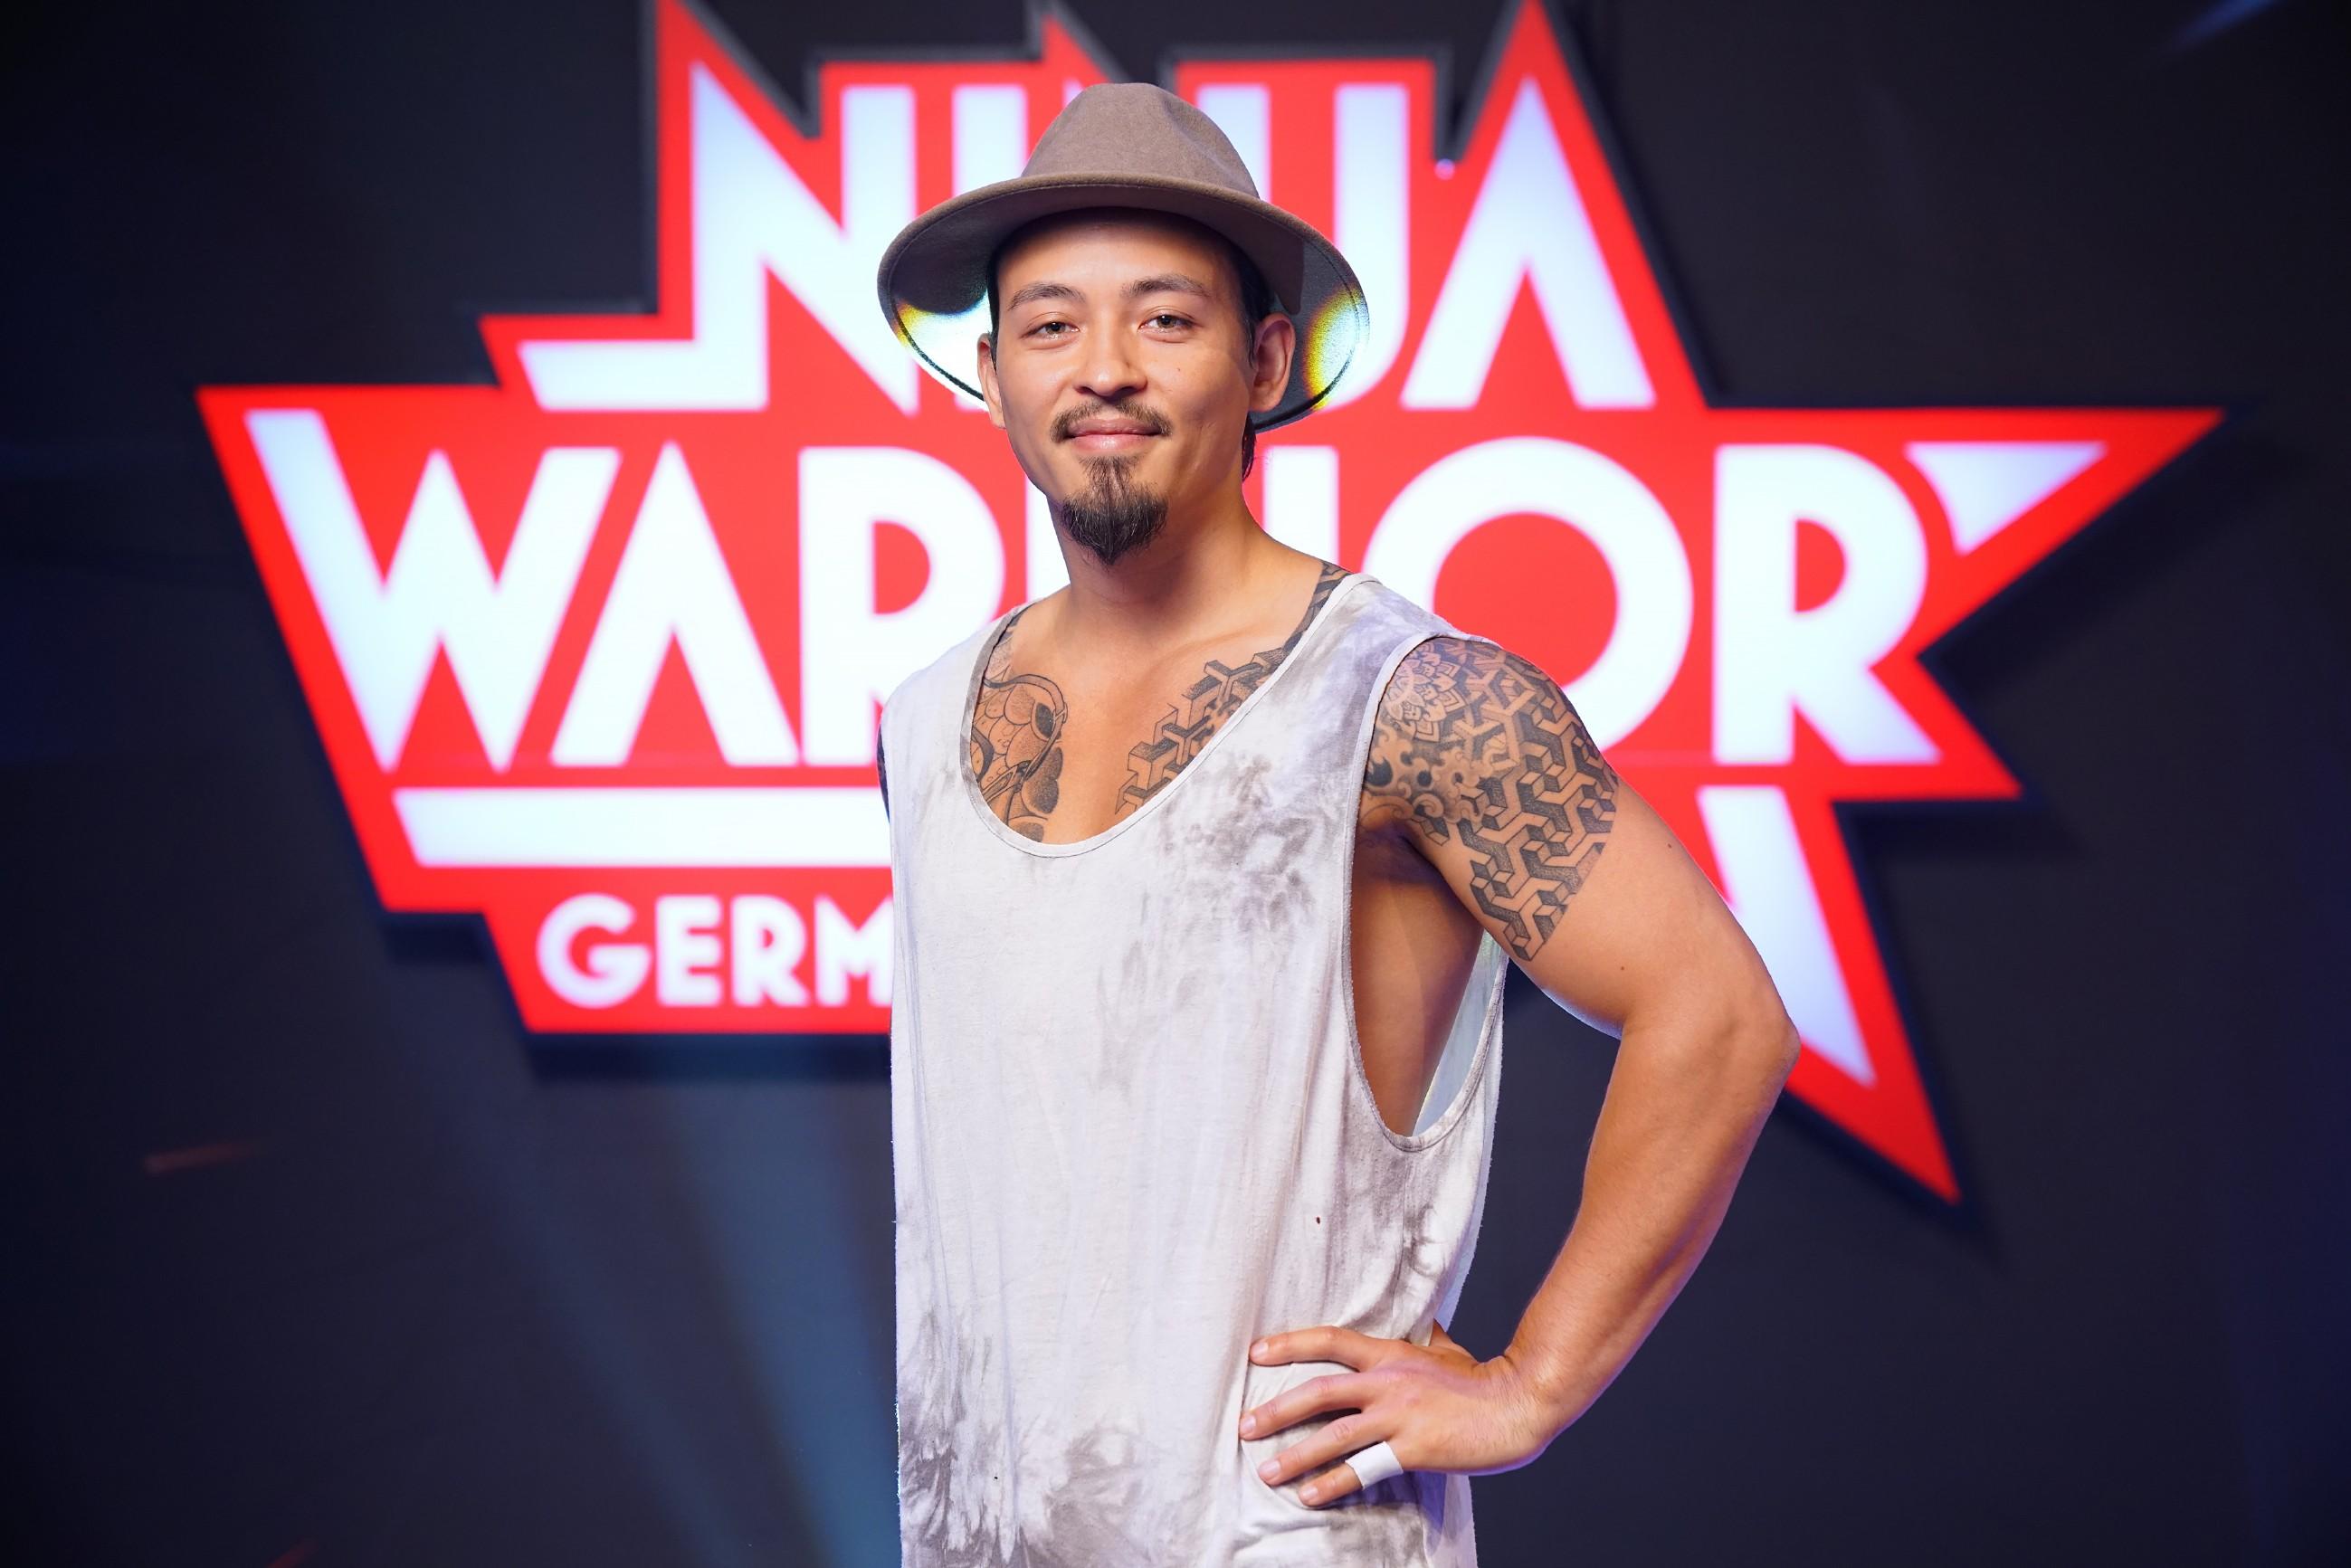 Ninja Warrior Germany 2017 - Jun Kim